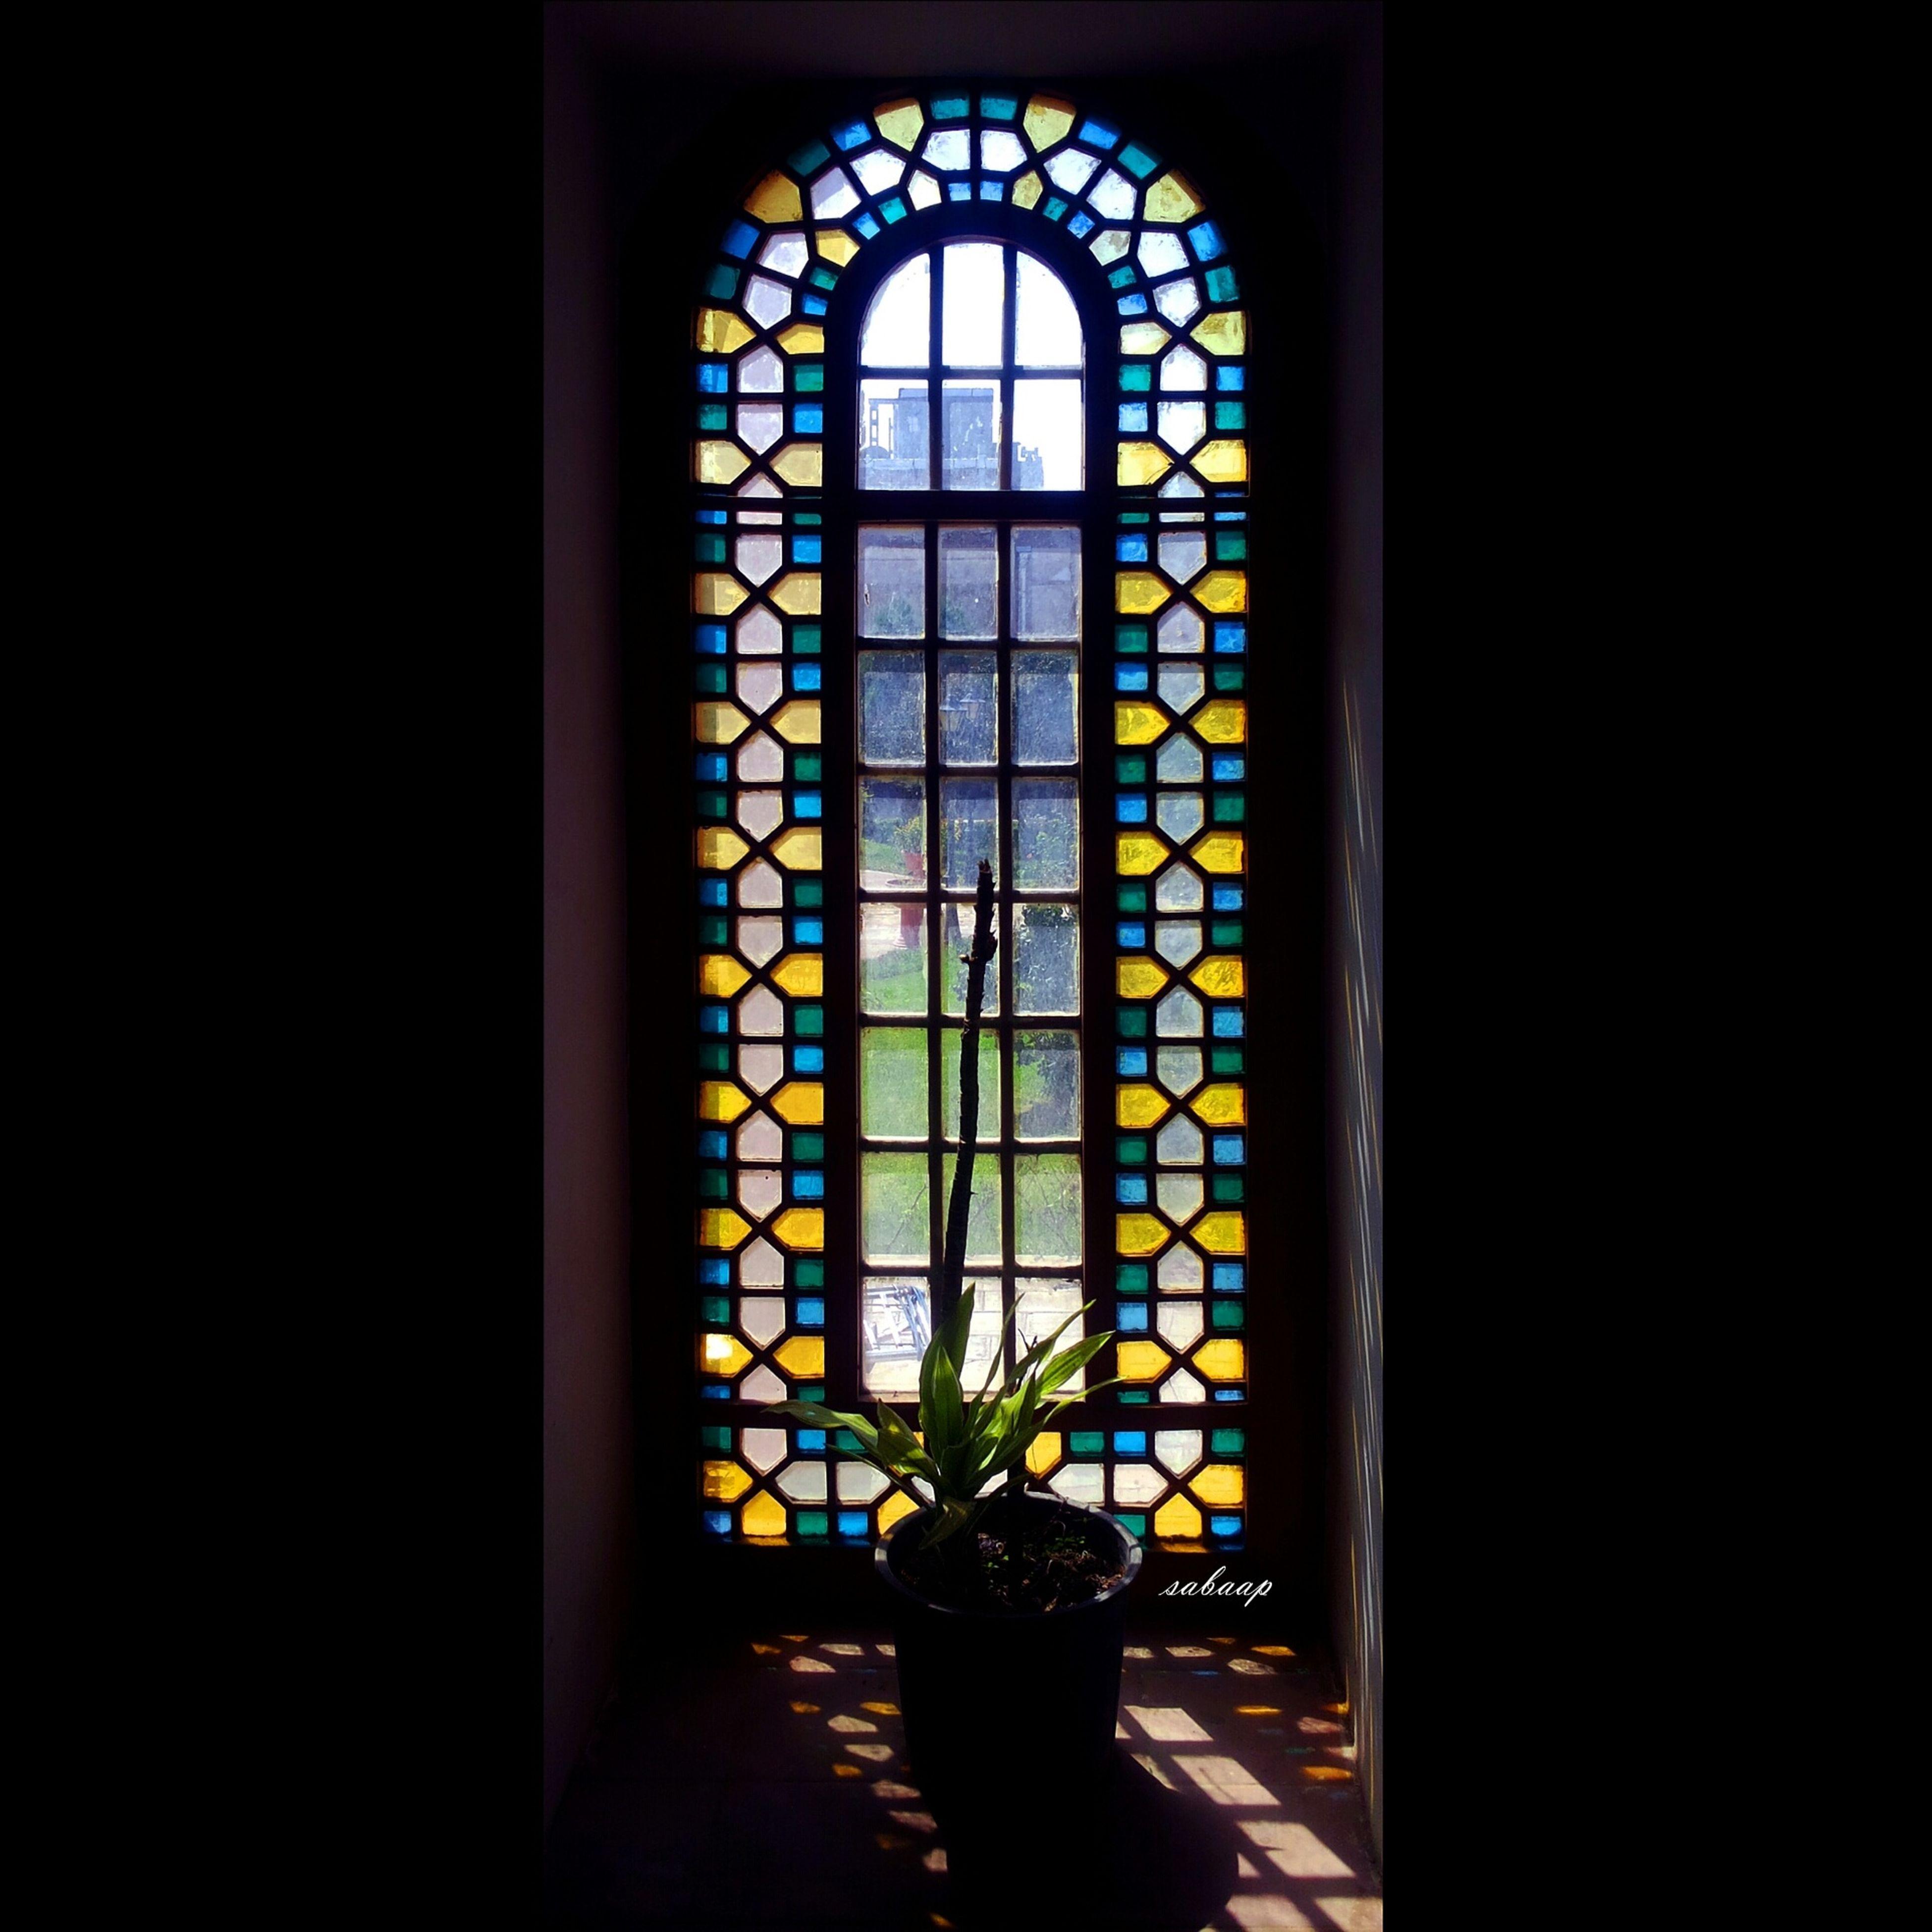 خانه بهنام First Eyeem Photo